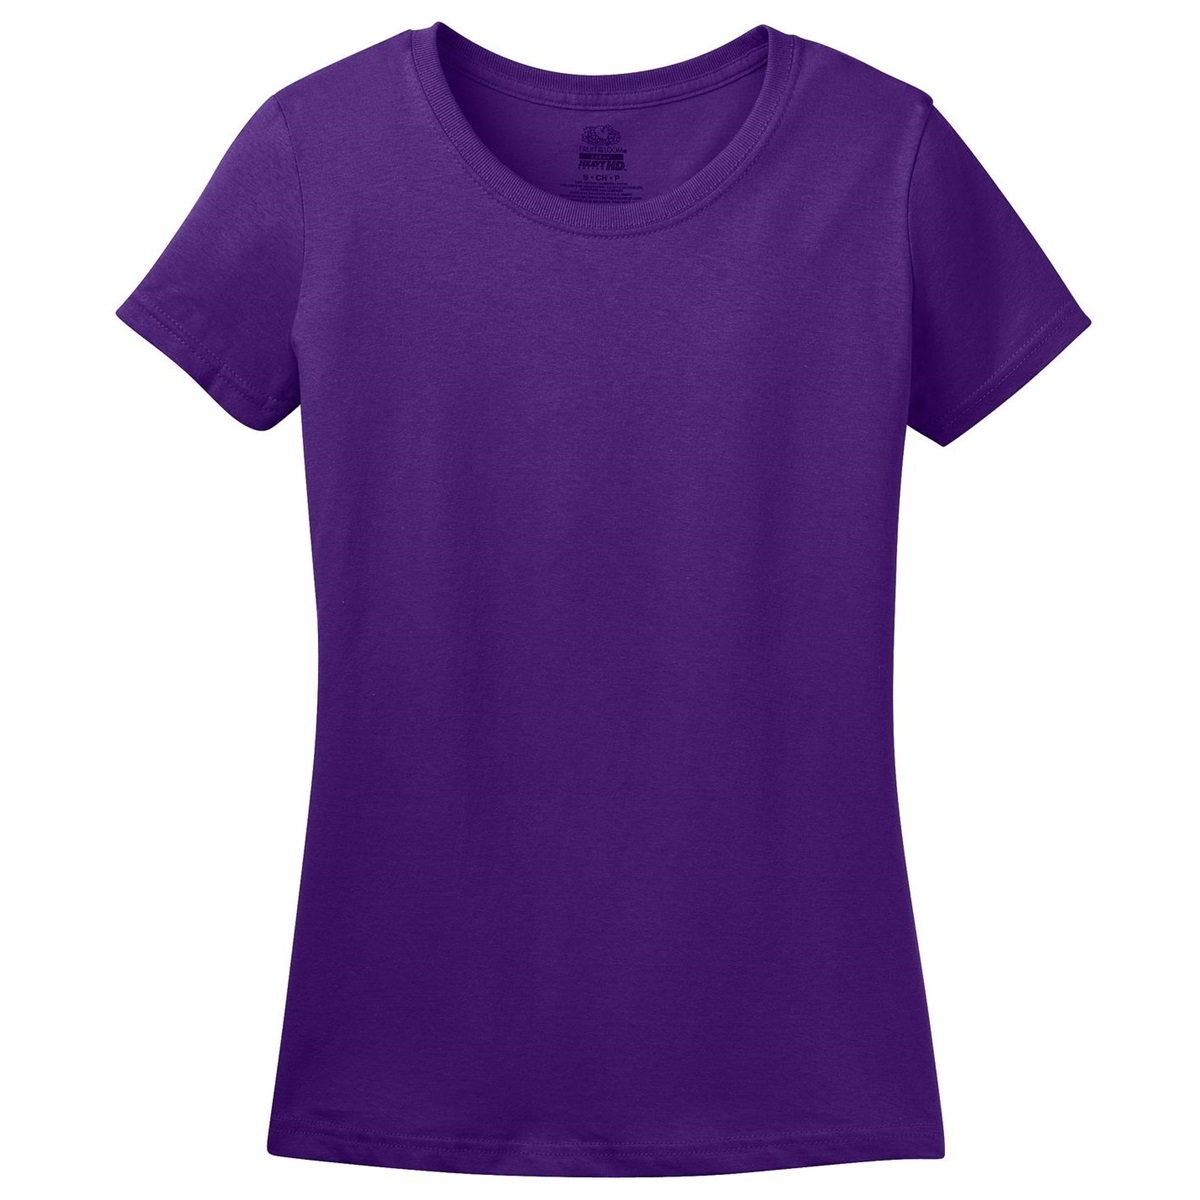 fruit of the loom l3930 ladies heavy cotton hd t shirt purple. Black Bedroom Furniture Sets. Home Design Ideas